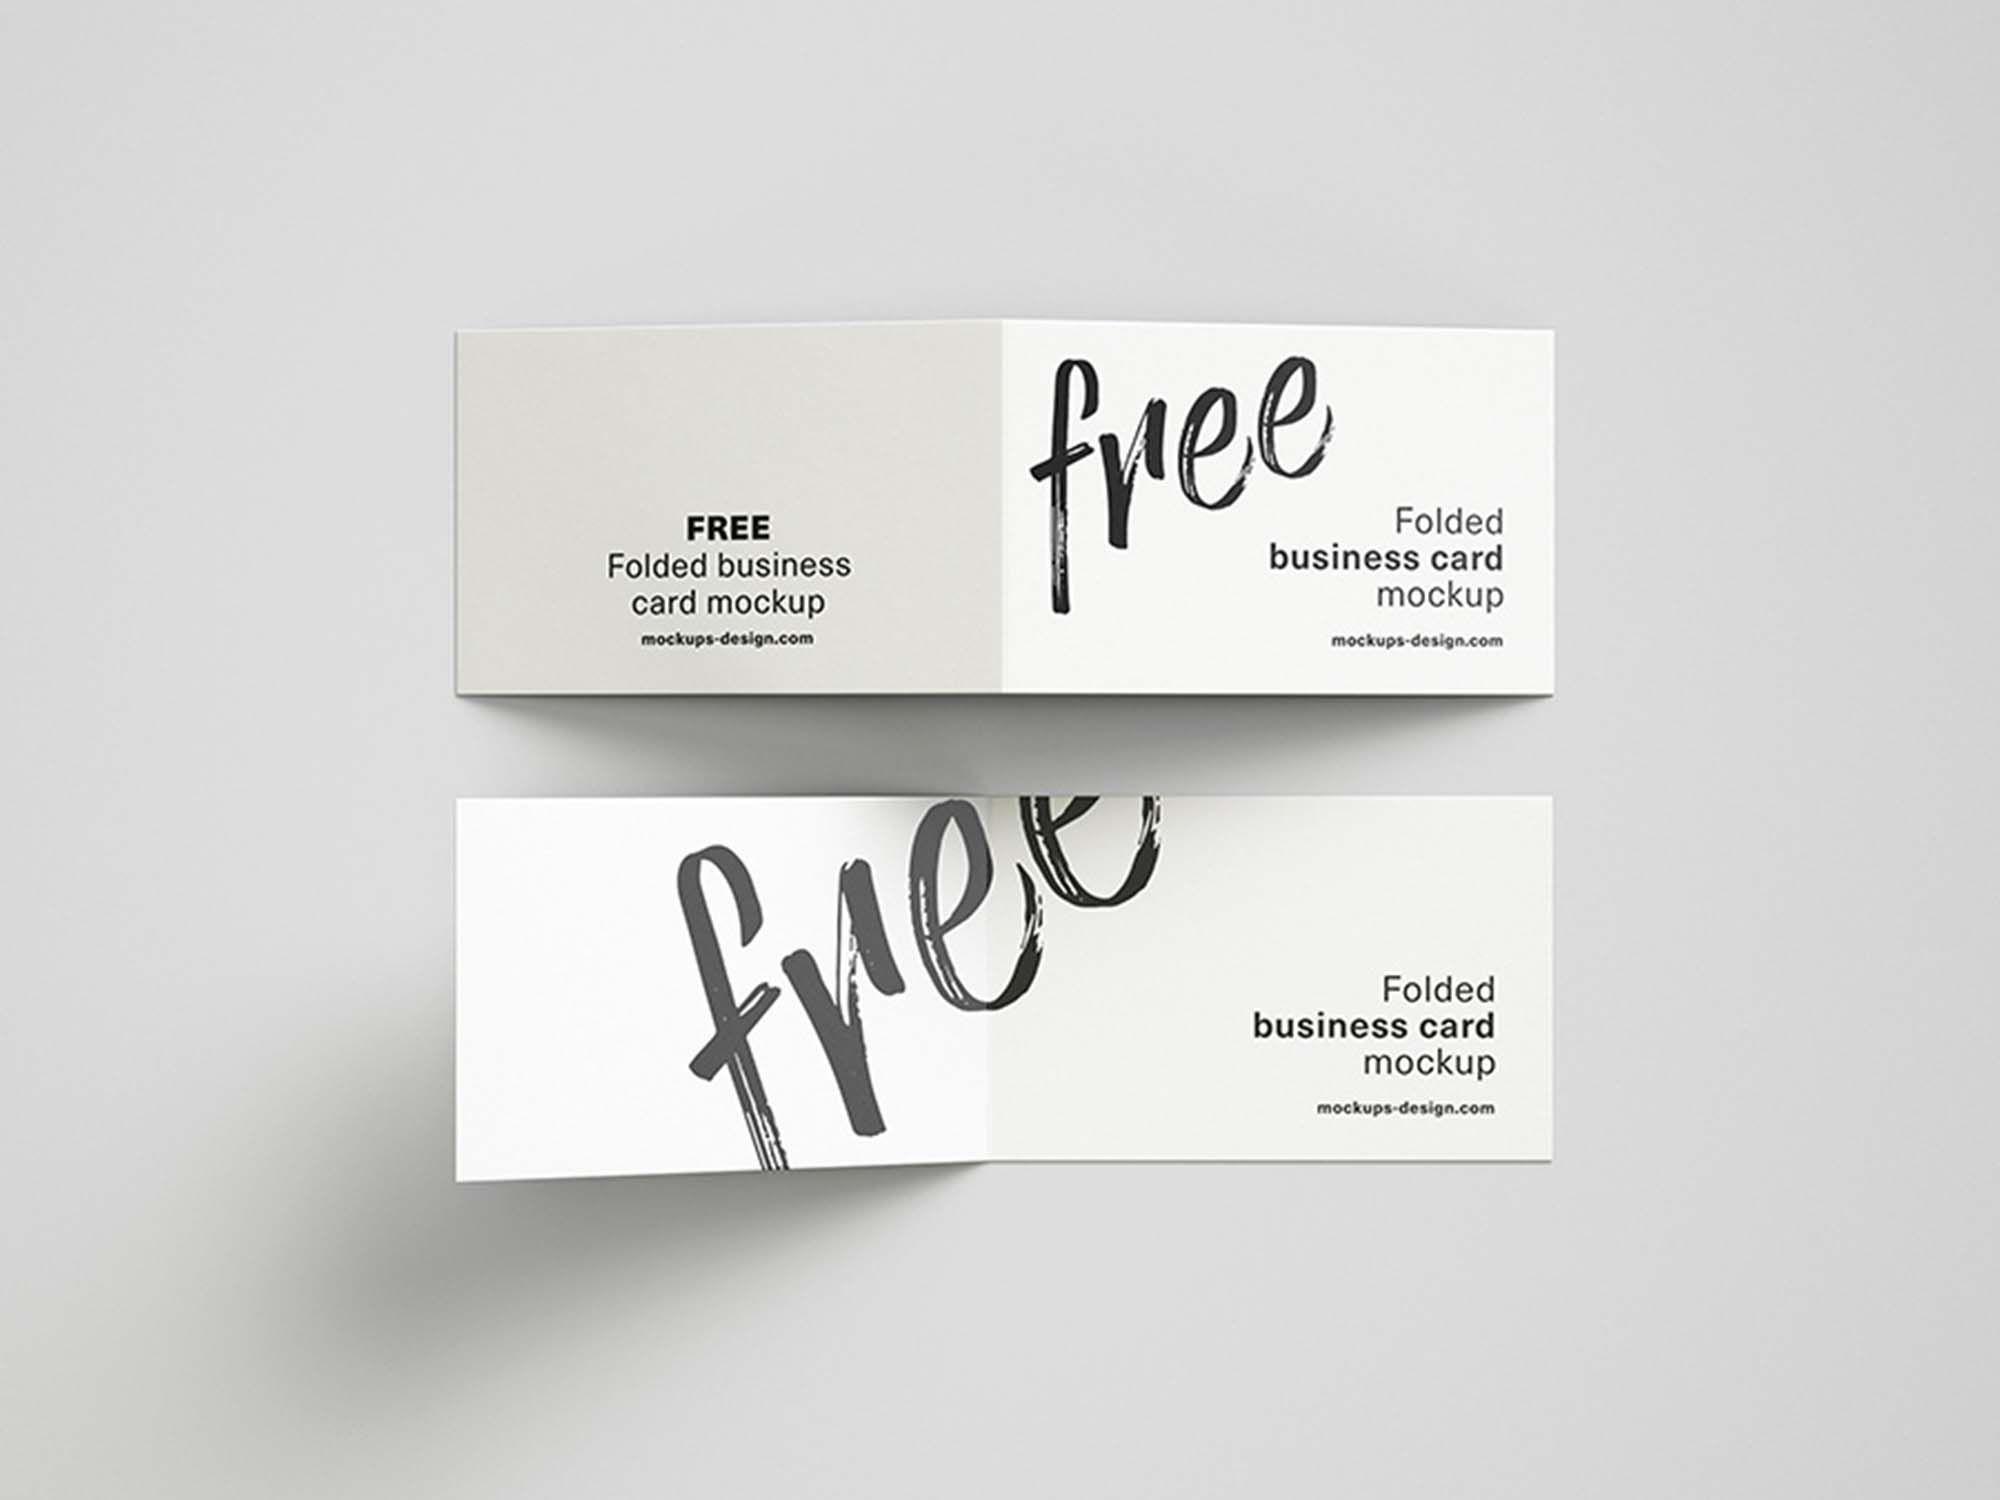 006 Astounding Folding Busines Card Template Highest Quality  Folded Photoshop Ai FreeFull